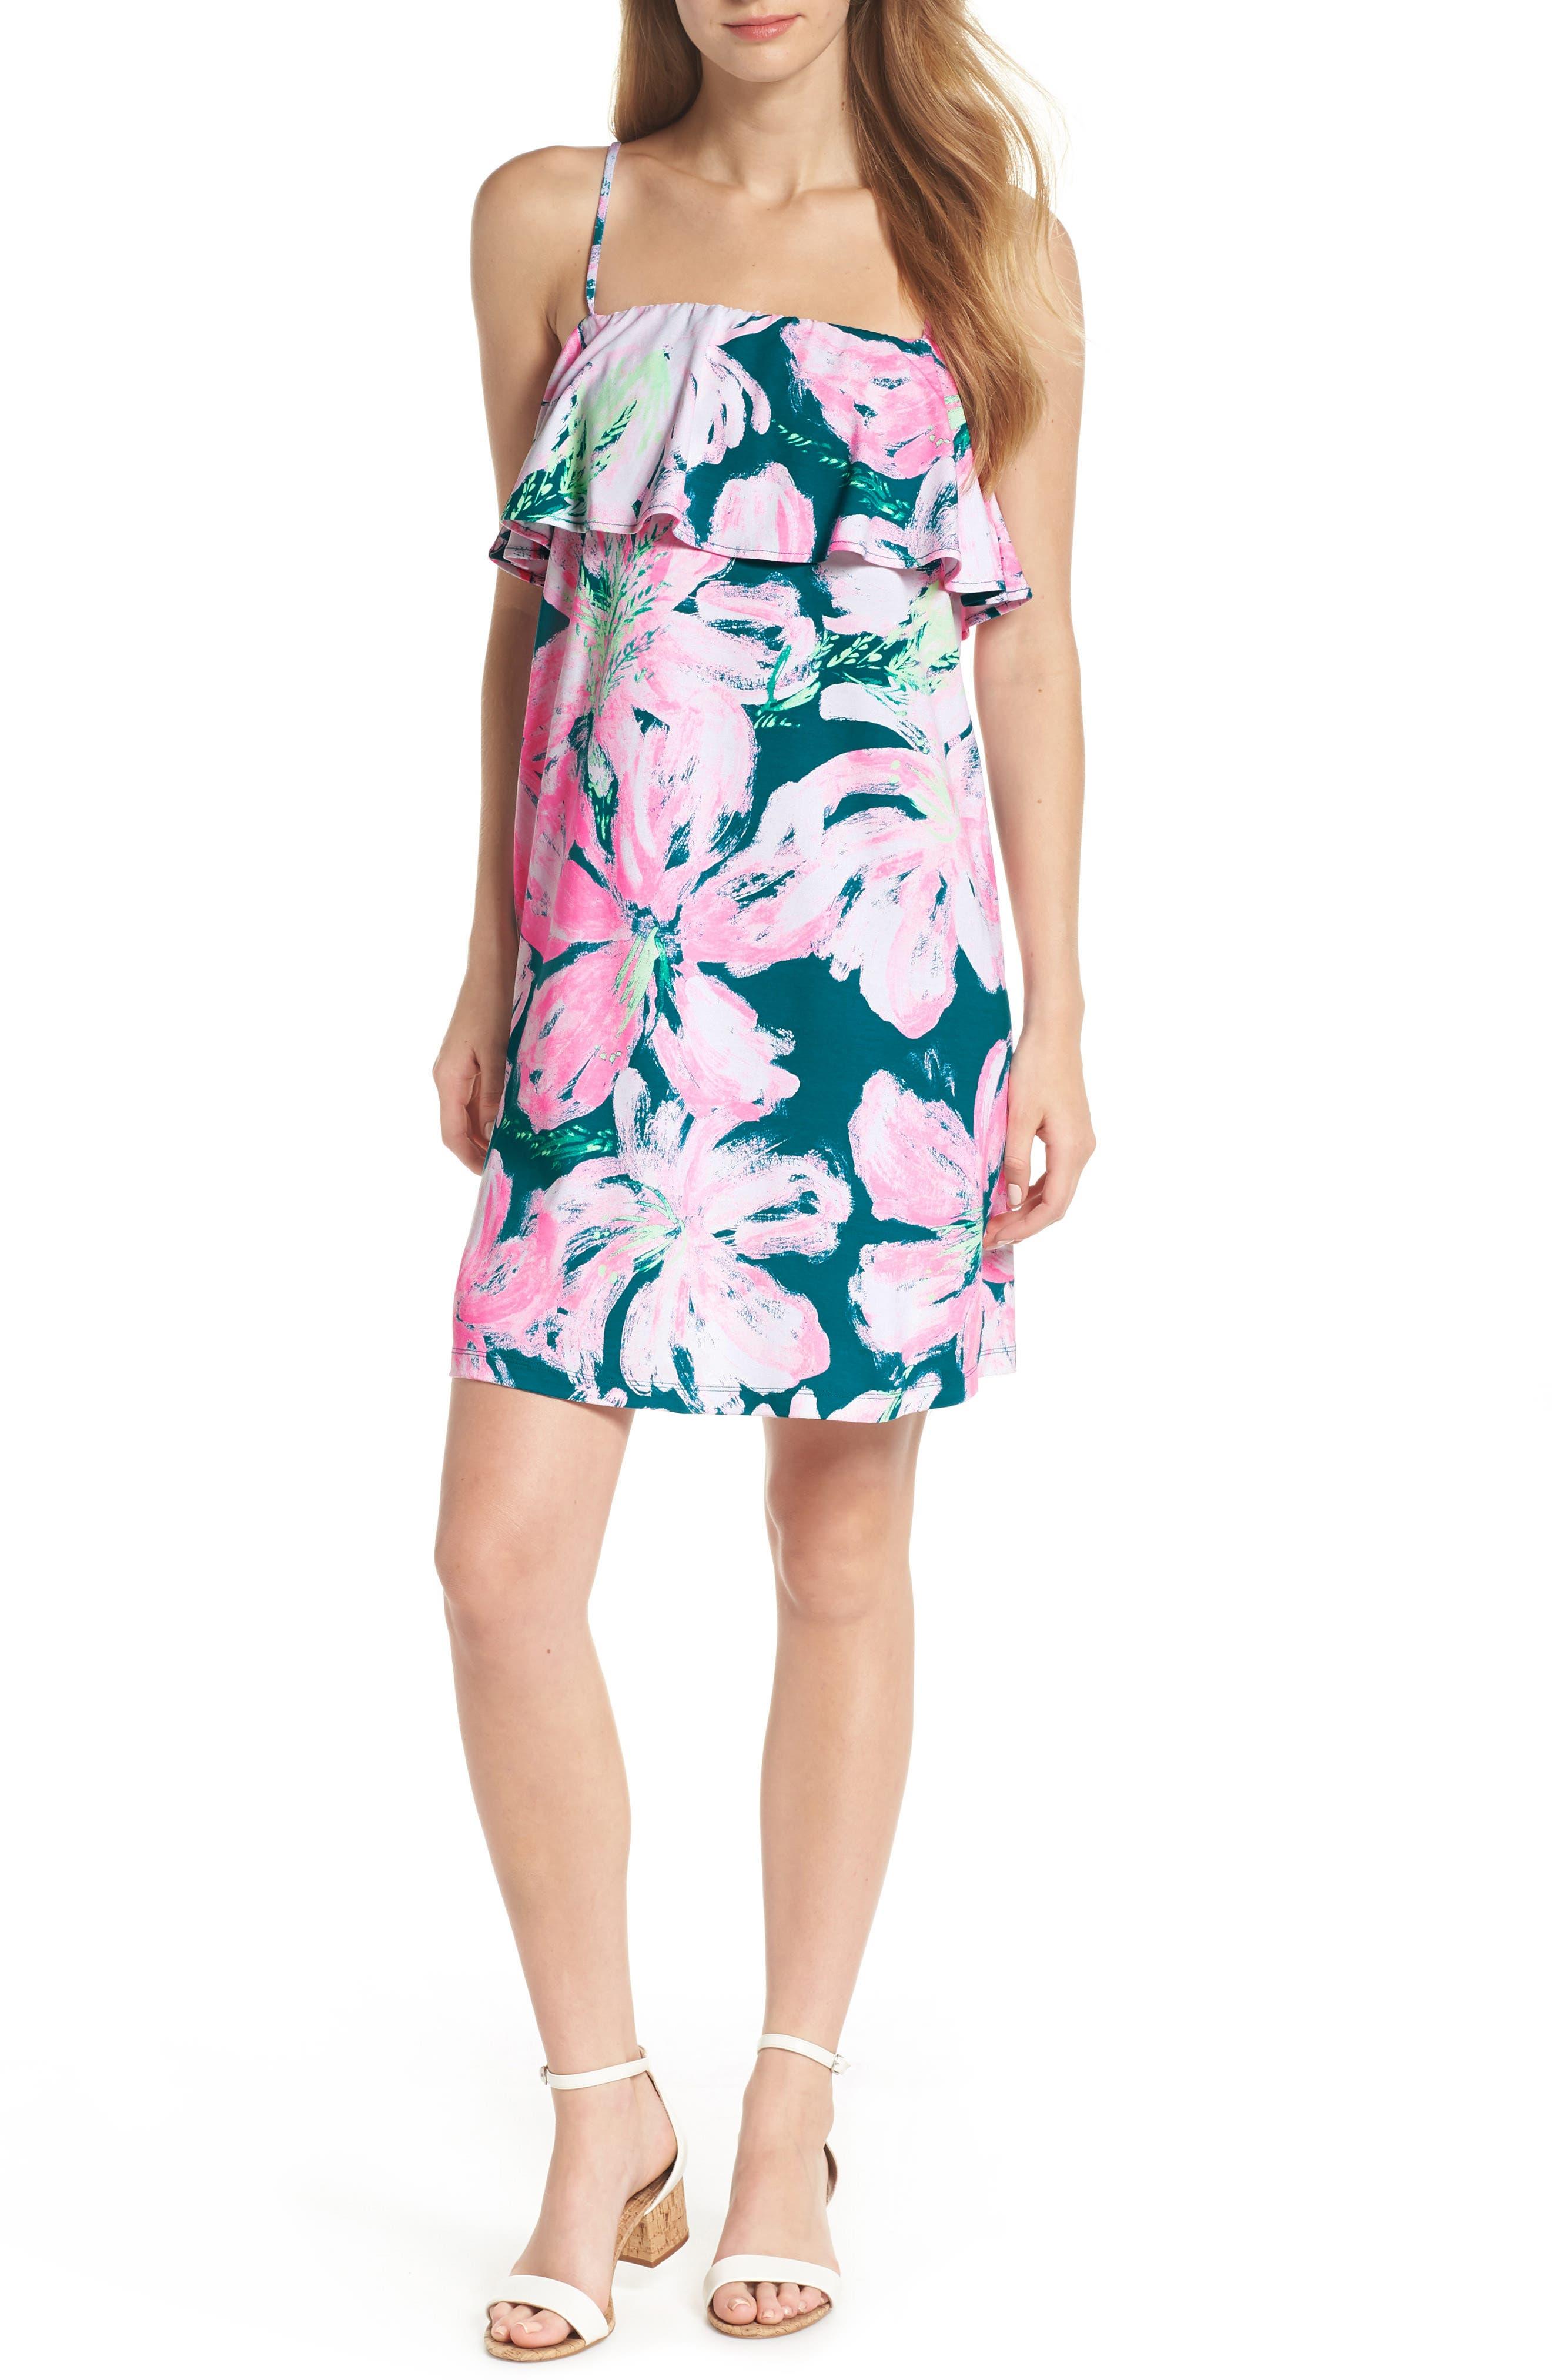 Lilly Pulitzer Annastasha Popover Shift Dress, Blue/green